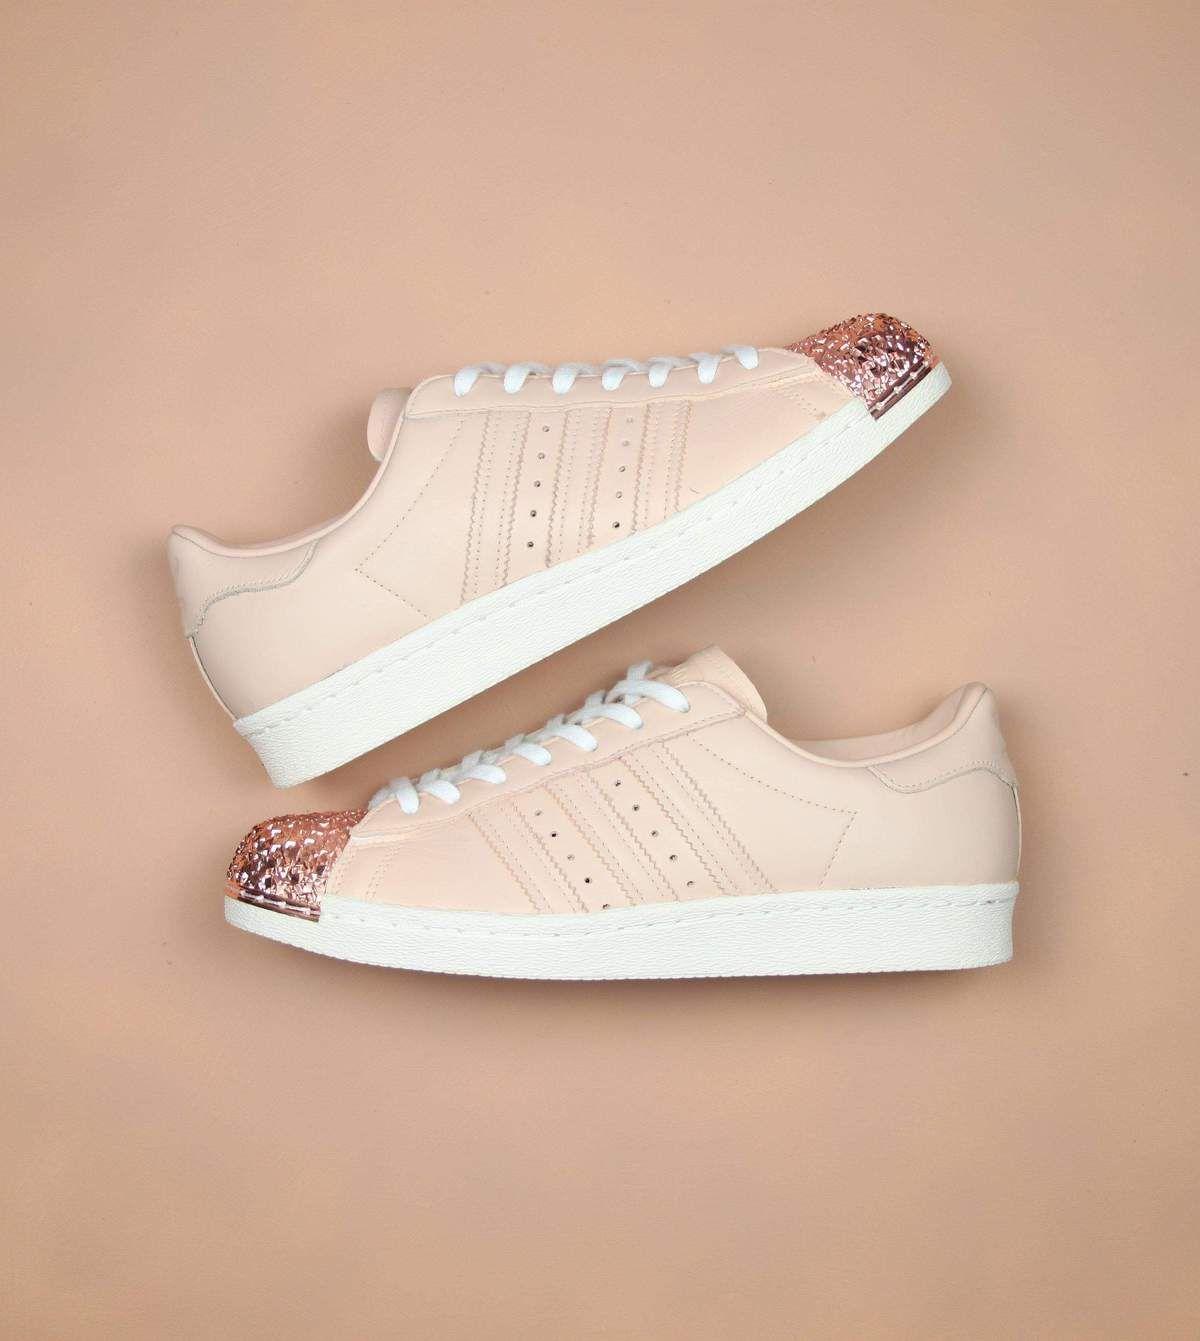 rose gold shell toe adidas